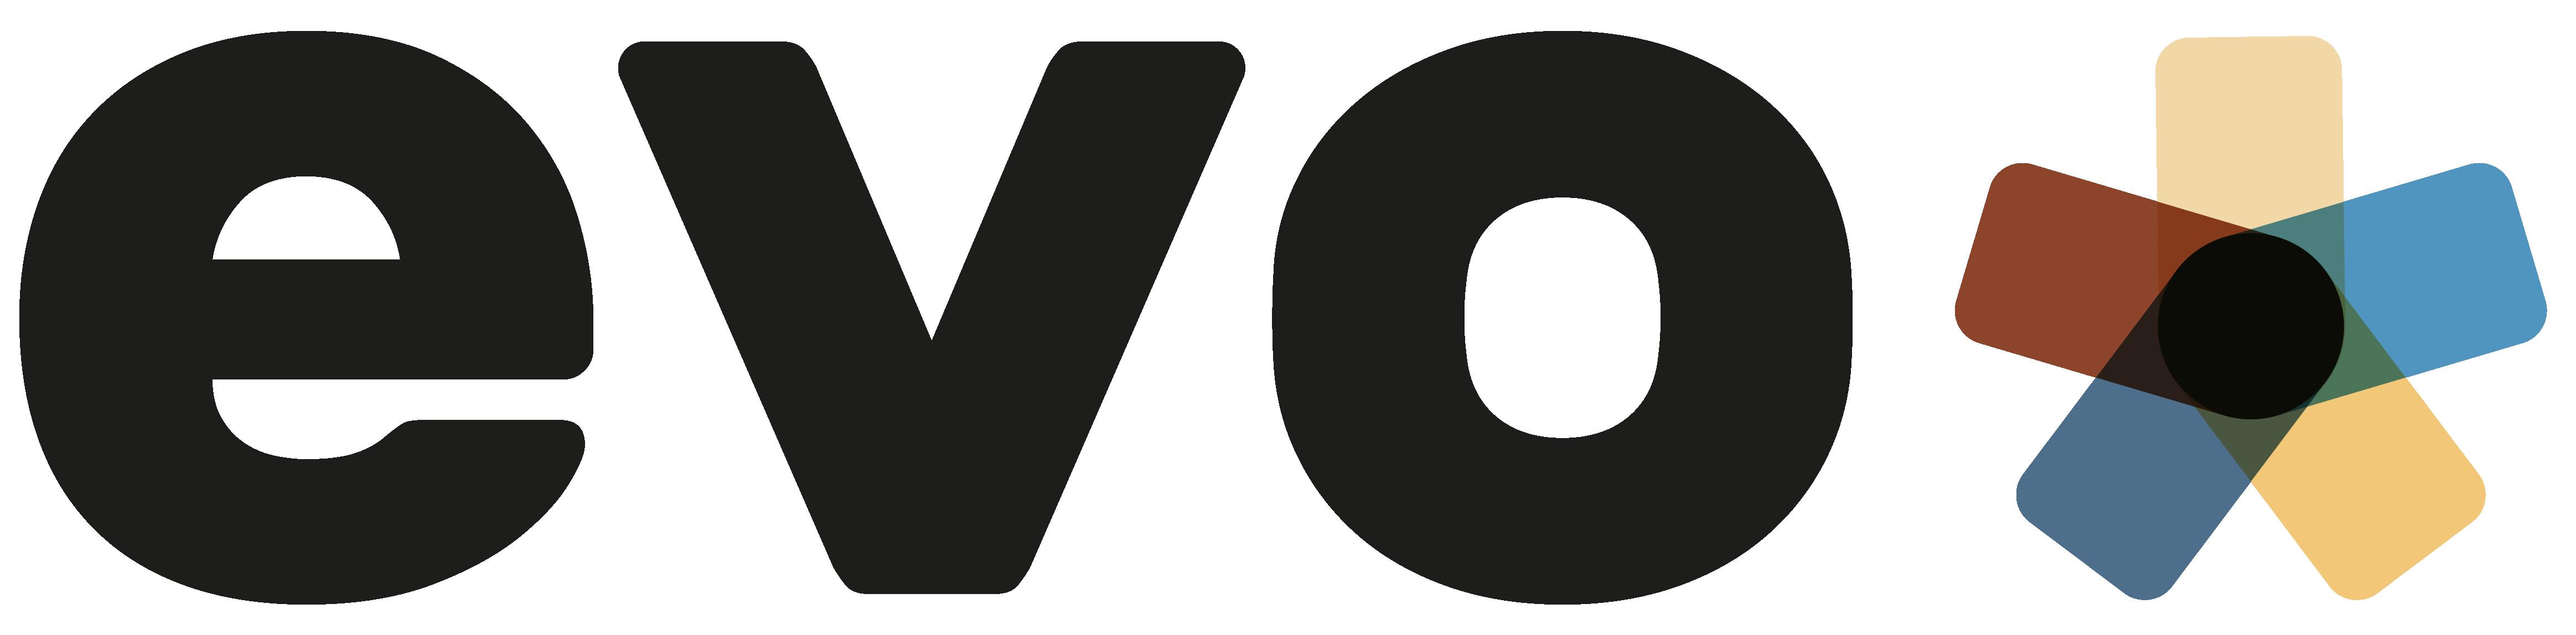 EvoStar 2020